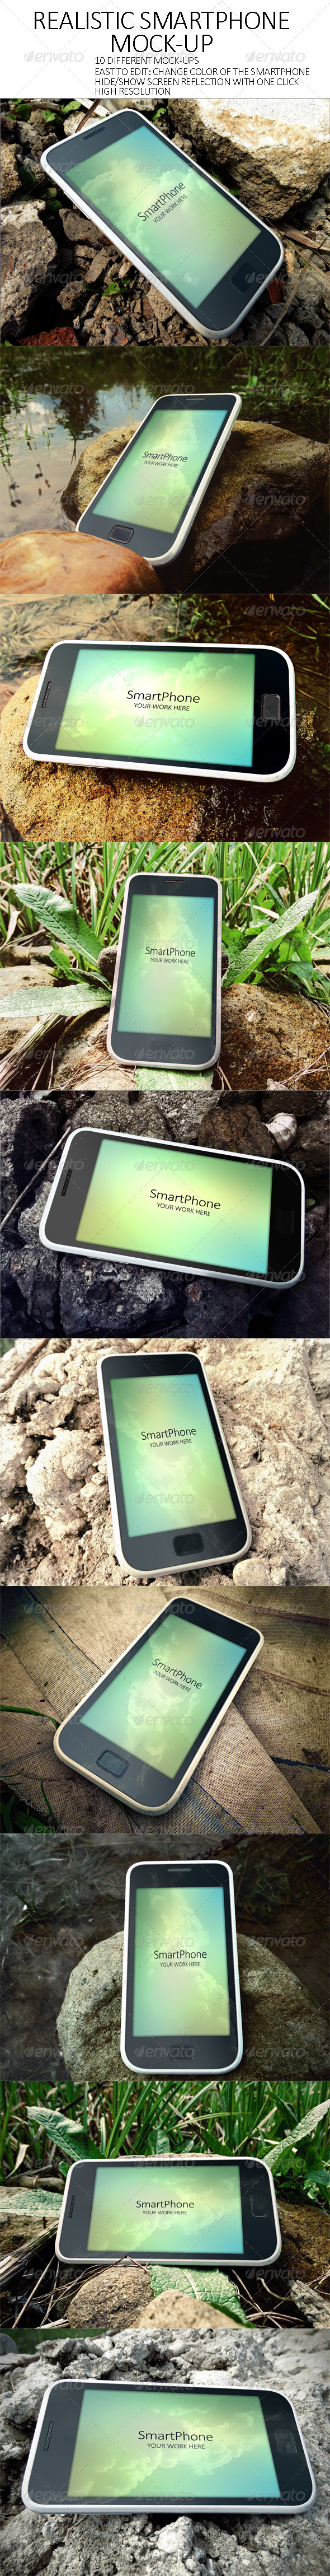 GraphicRiver Realistic SmartPhone Mock-Up 7667233